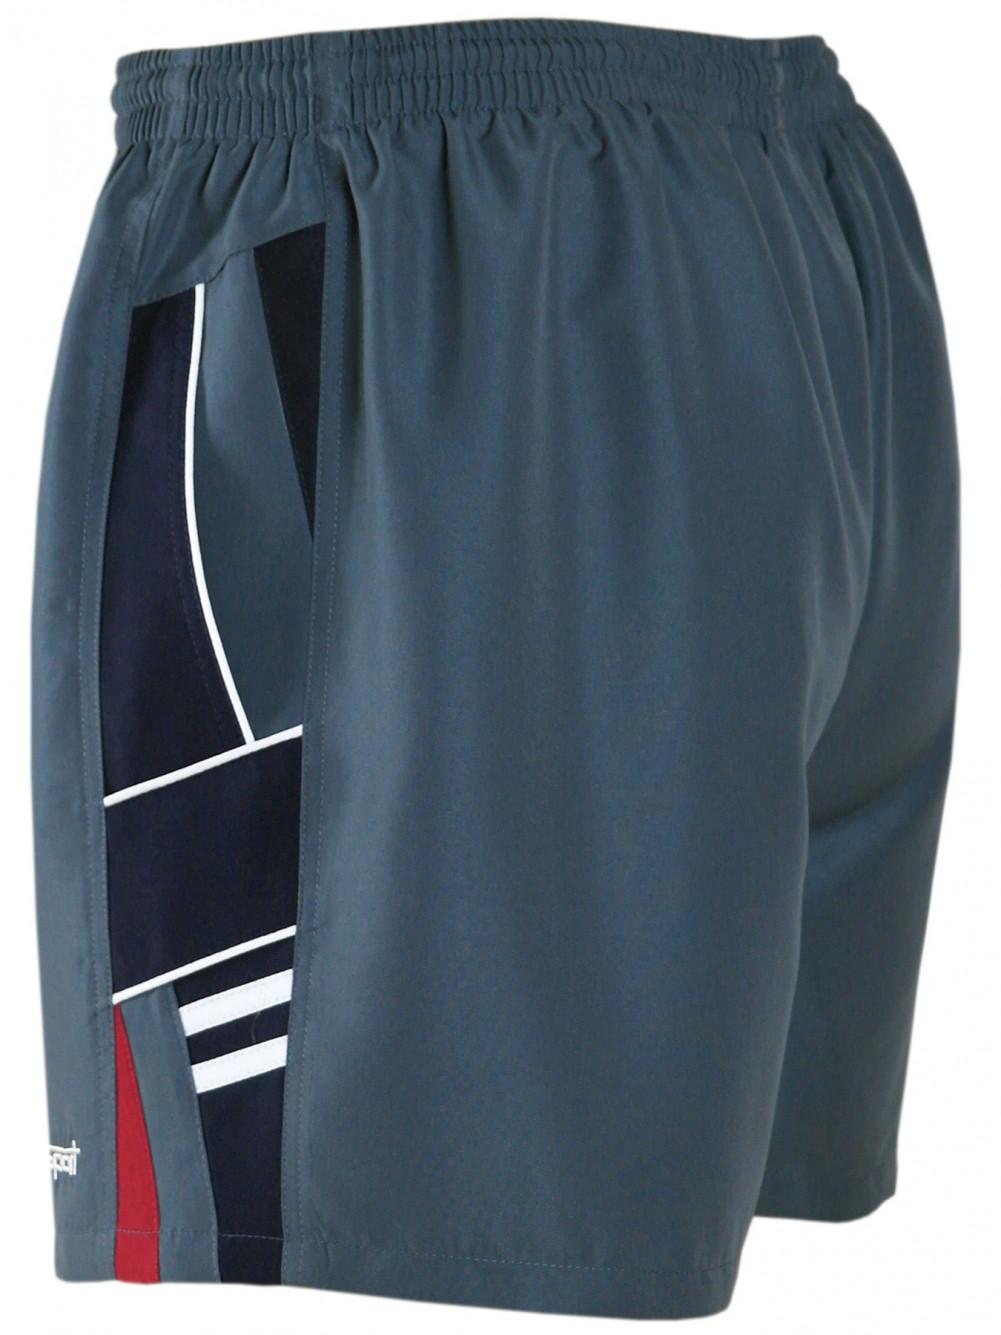 Herren Shorts kurze Hose aus ultra-leichter Mikrofaser - Grau-Navy